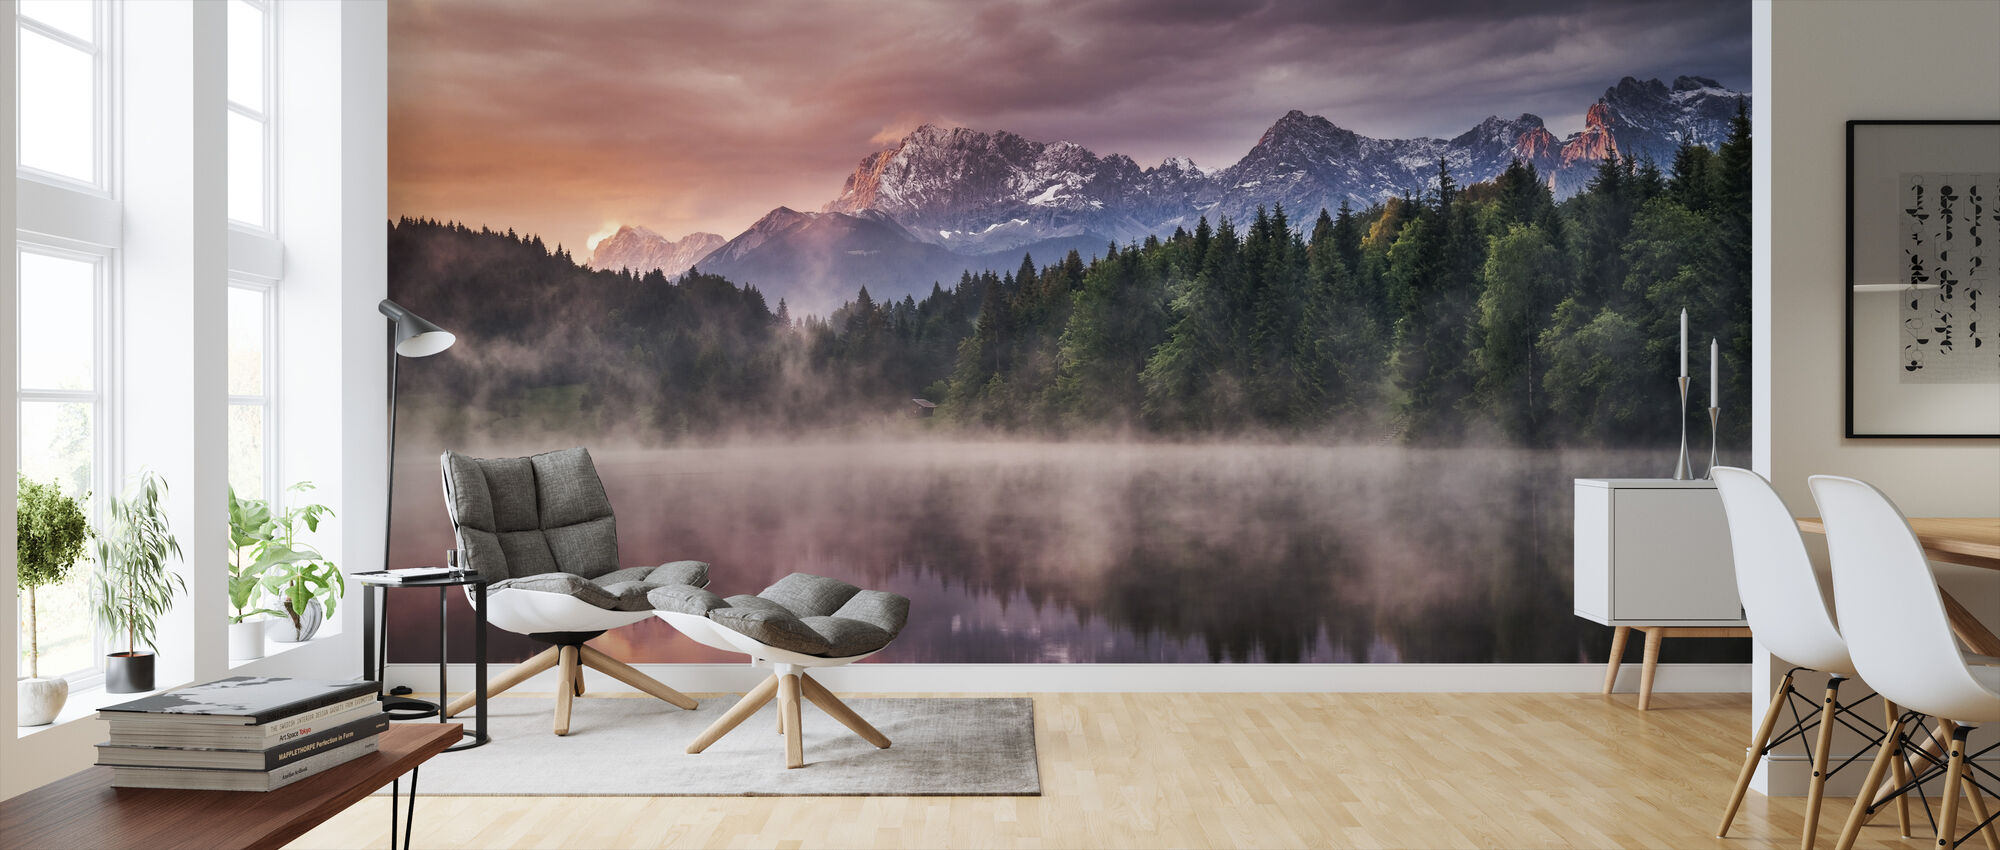 Sunrise at the Lake - Wallpaper - Living Room